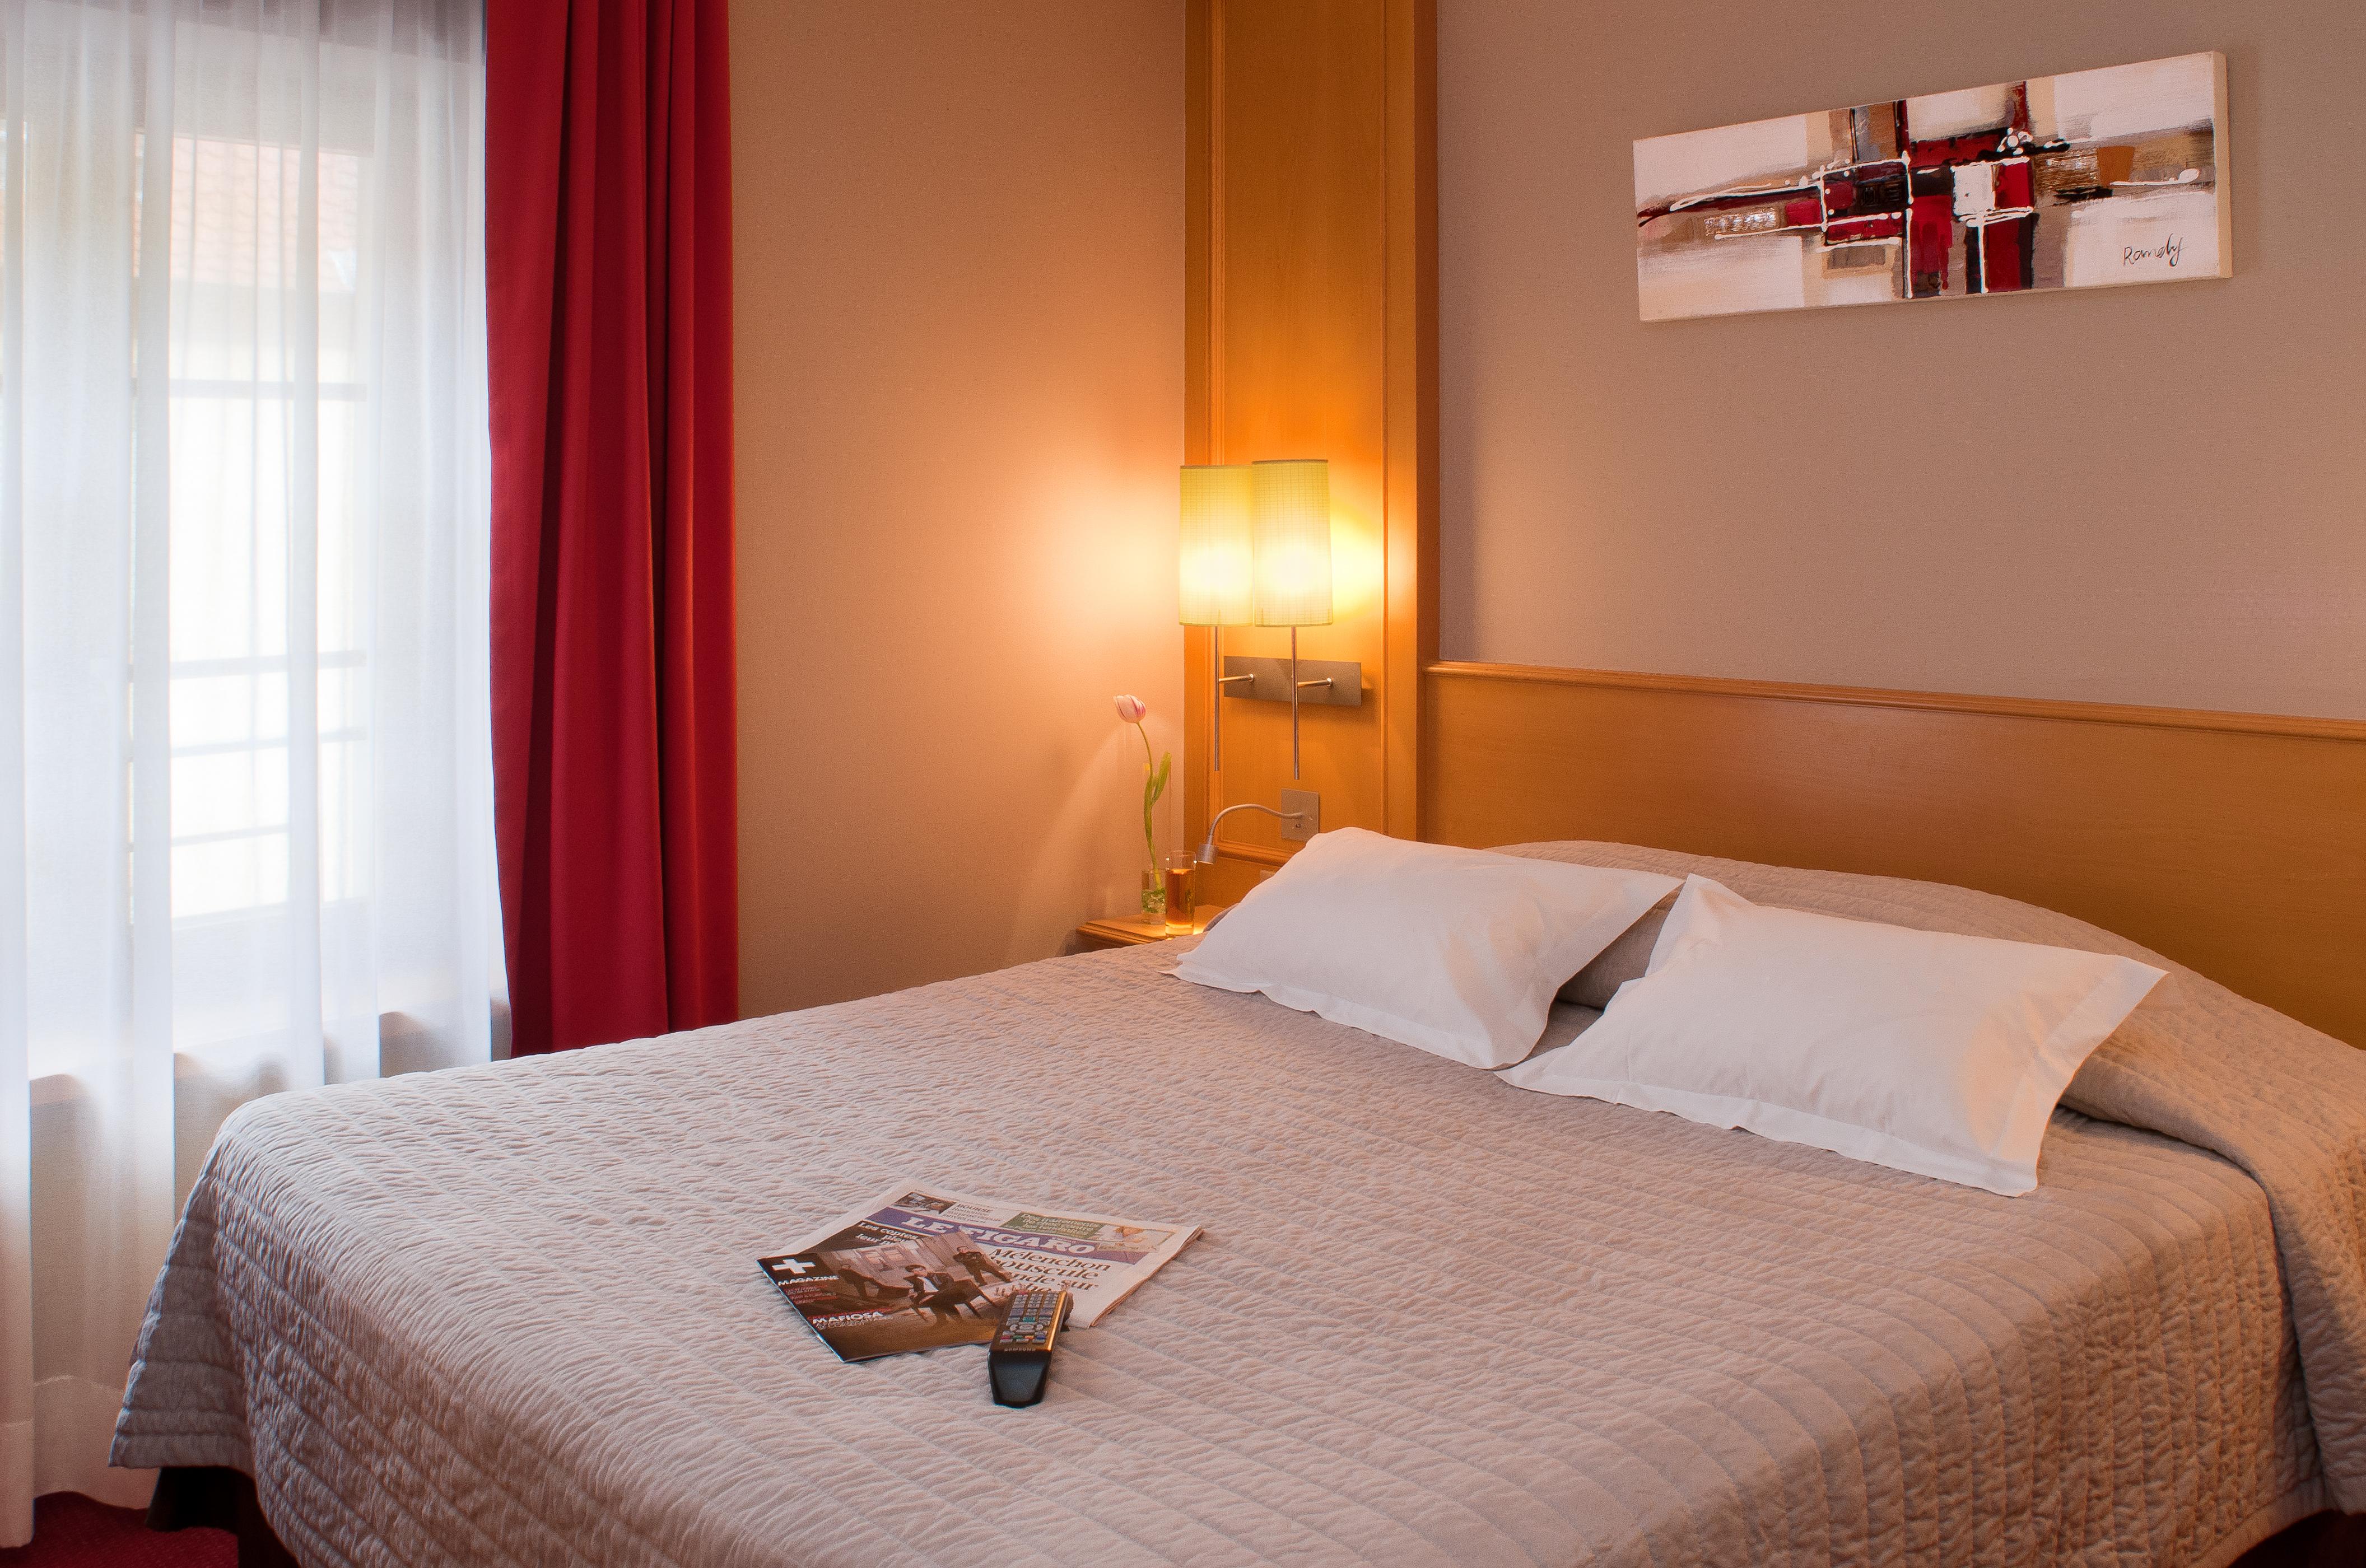 chambre 203 bis hotel restaurant colmar le rapp h tel centre colmar alsace france. Black Bedroom Furniture Sets. Home Design Ideas